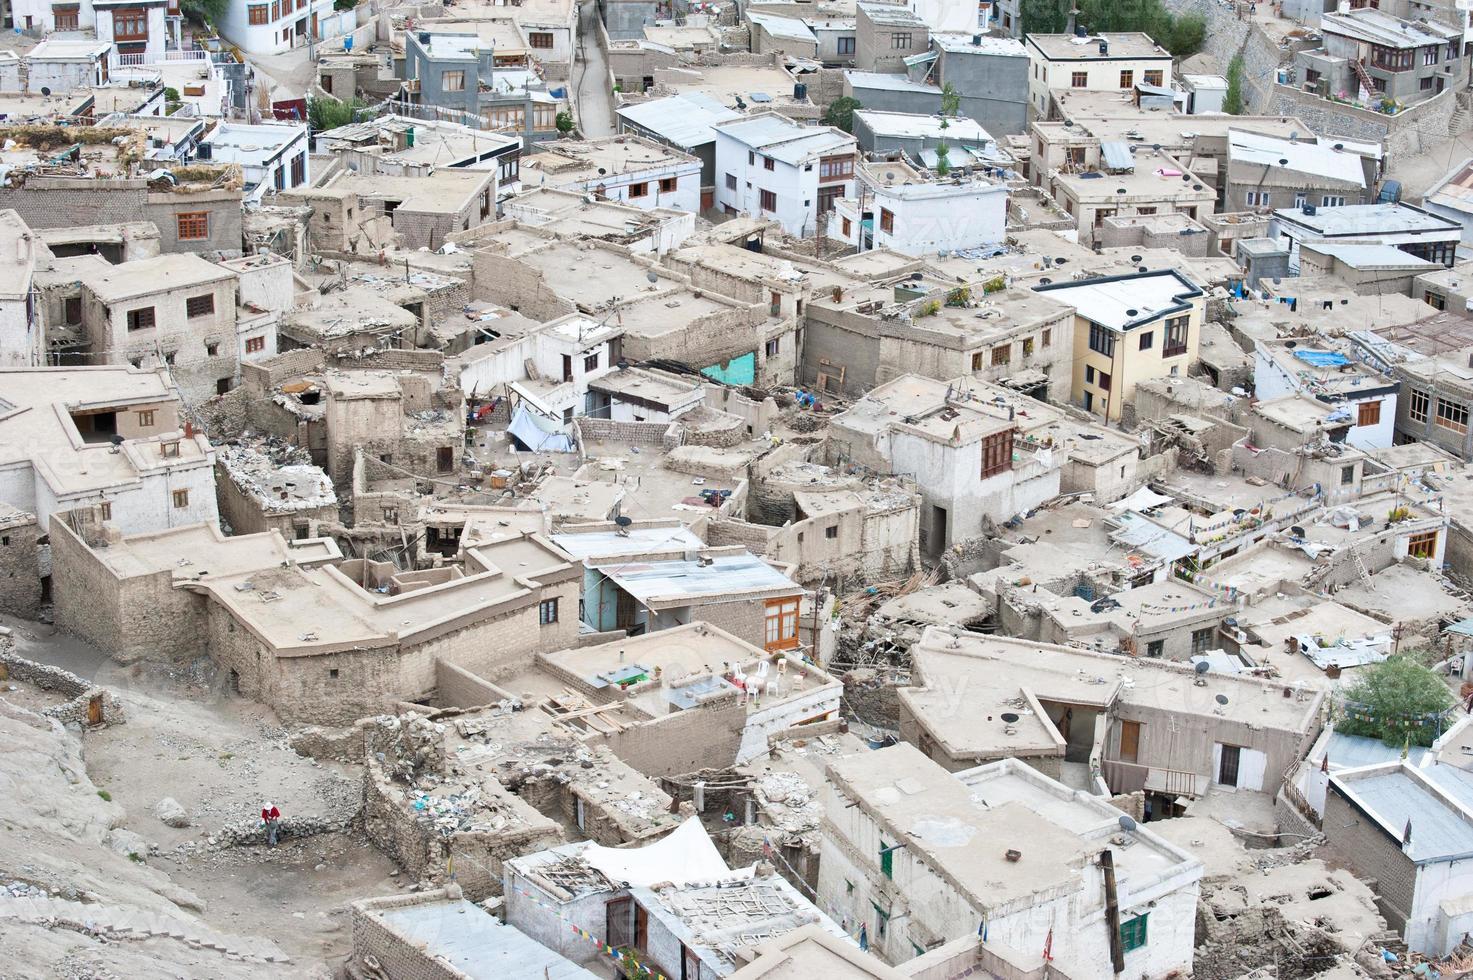 arquitetura da cidade de leh. india, ladakh foto